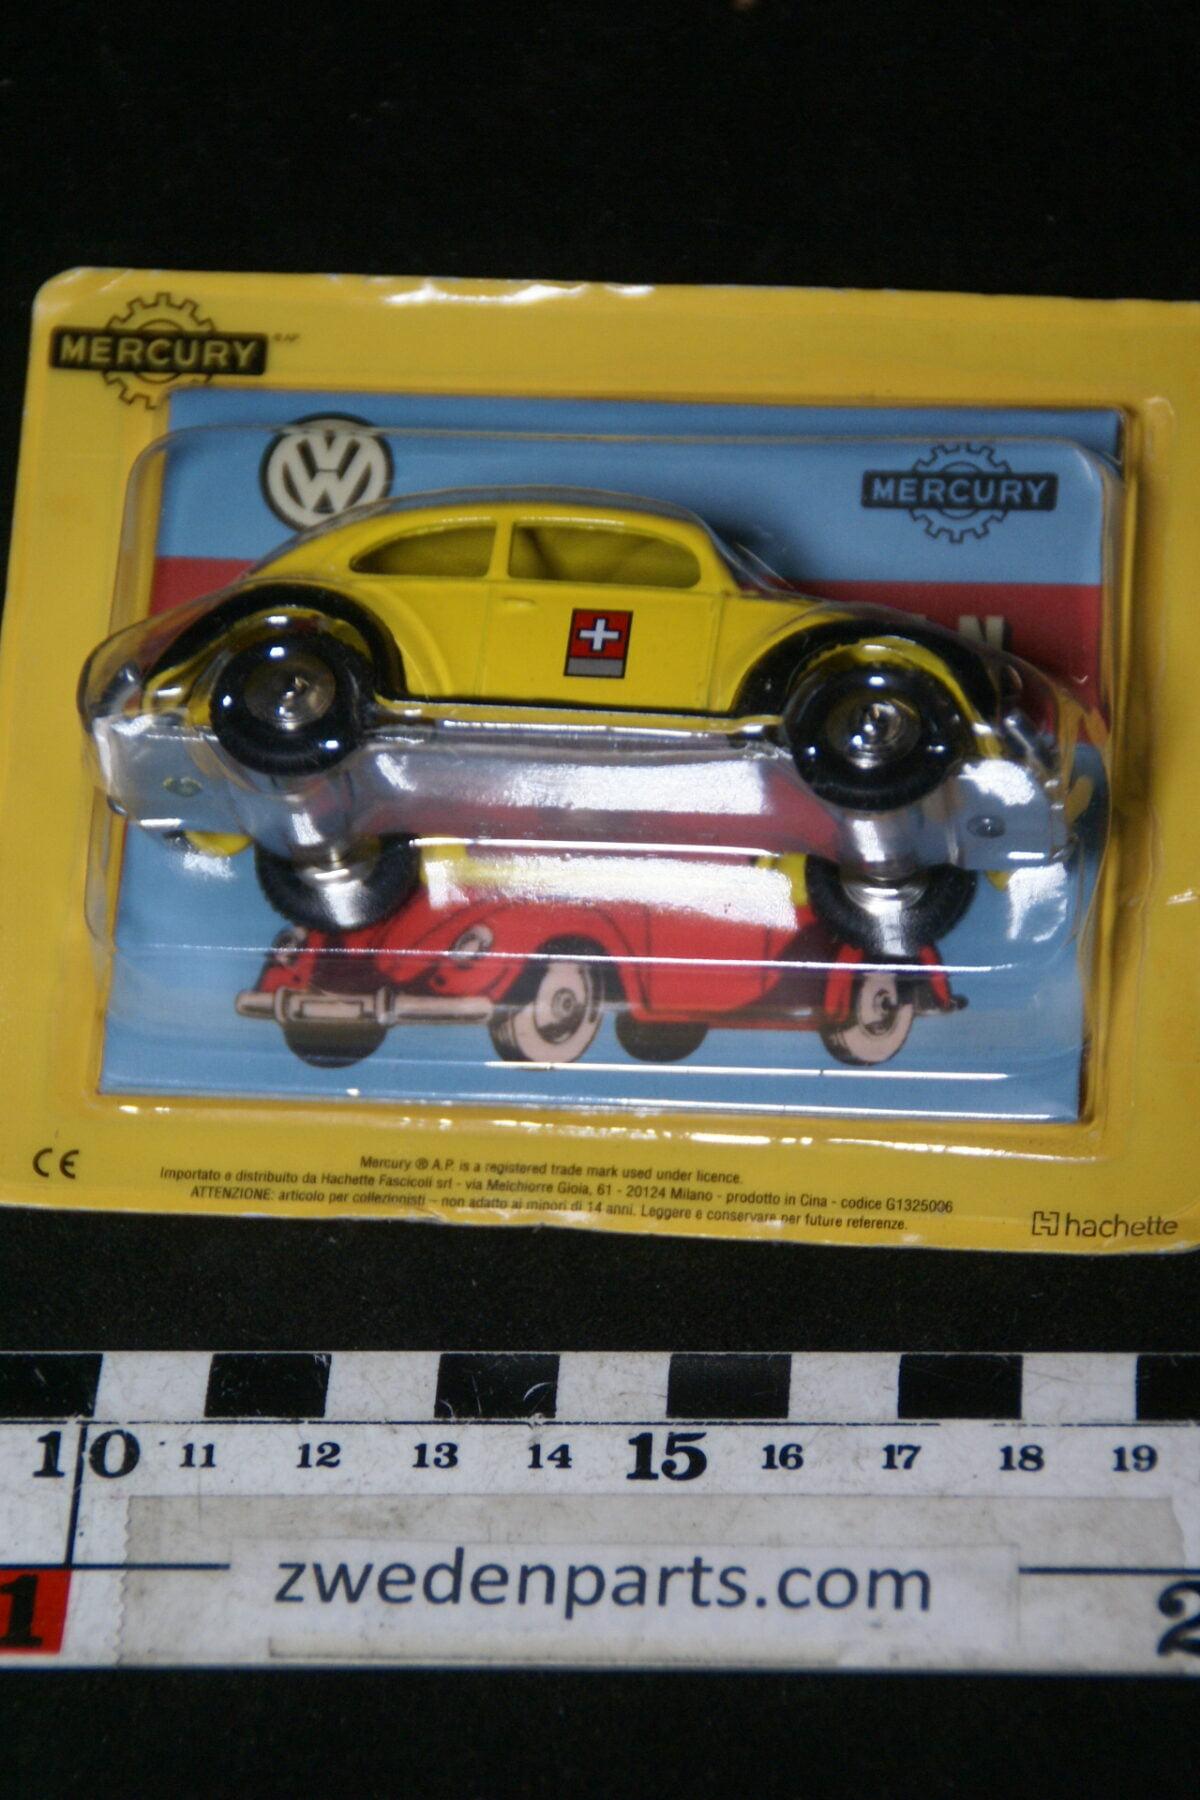 DSC01499 miniatuur Volkswagen Kever geel zwart 1op43 Mercury nr 15, MB-e5eabcac